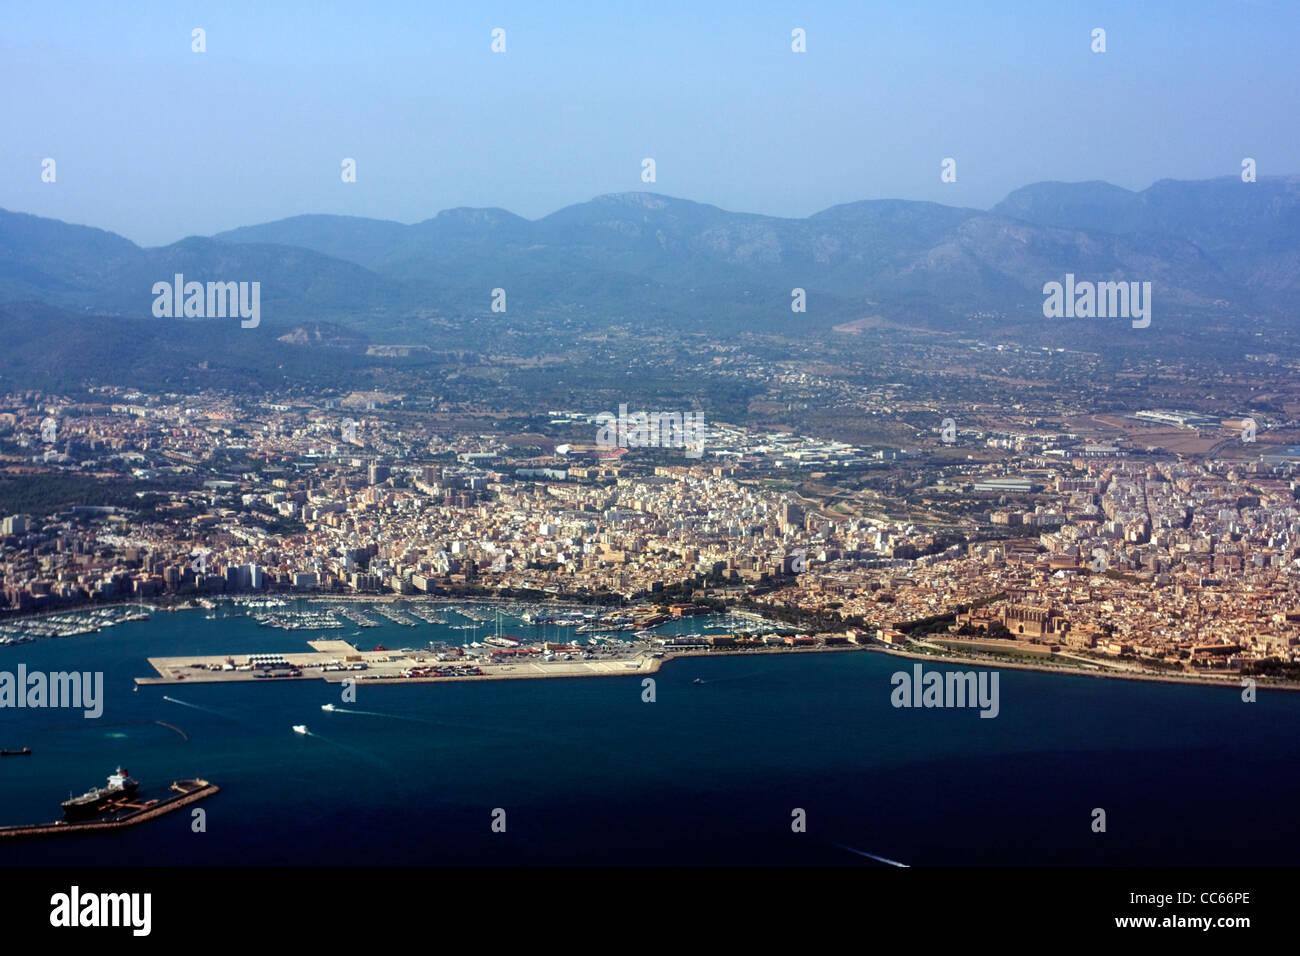 Aerial view of Palma, Majorca, Spain - Stock Image